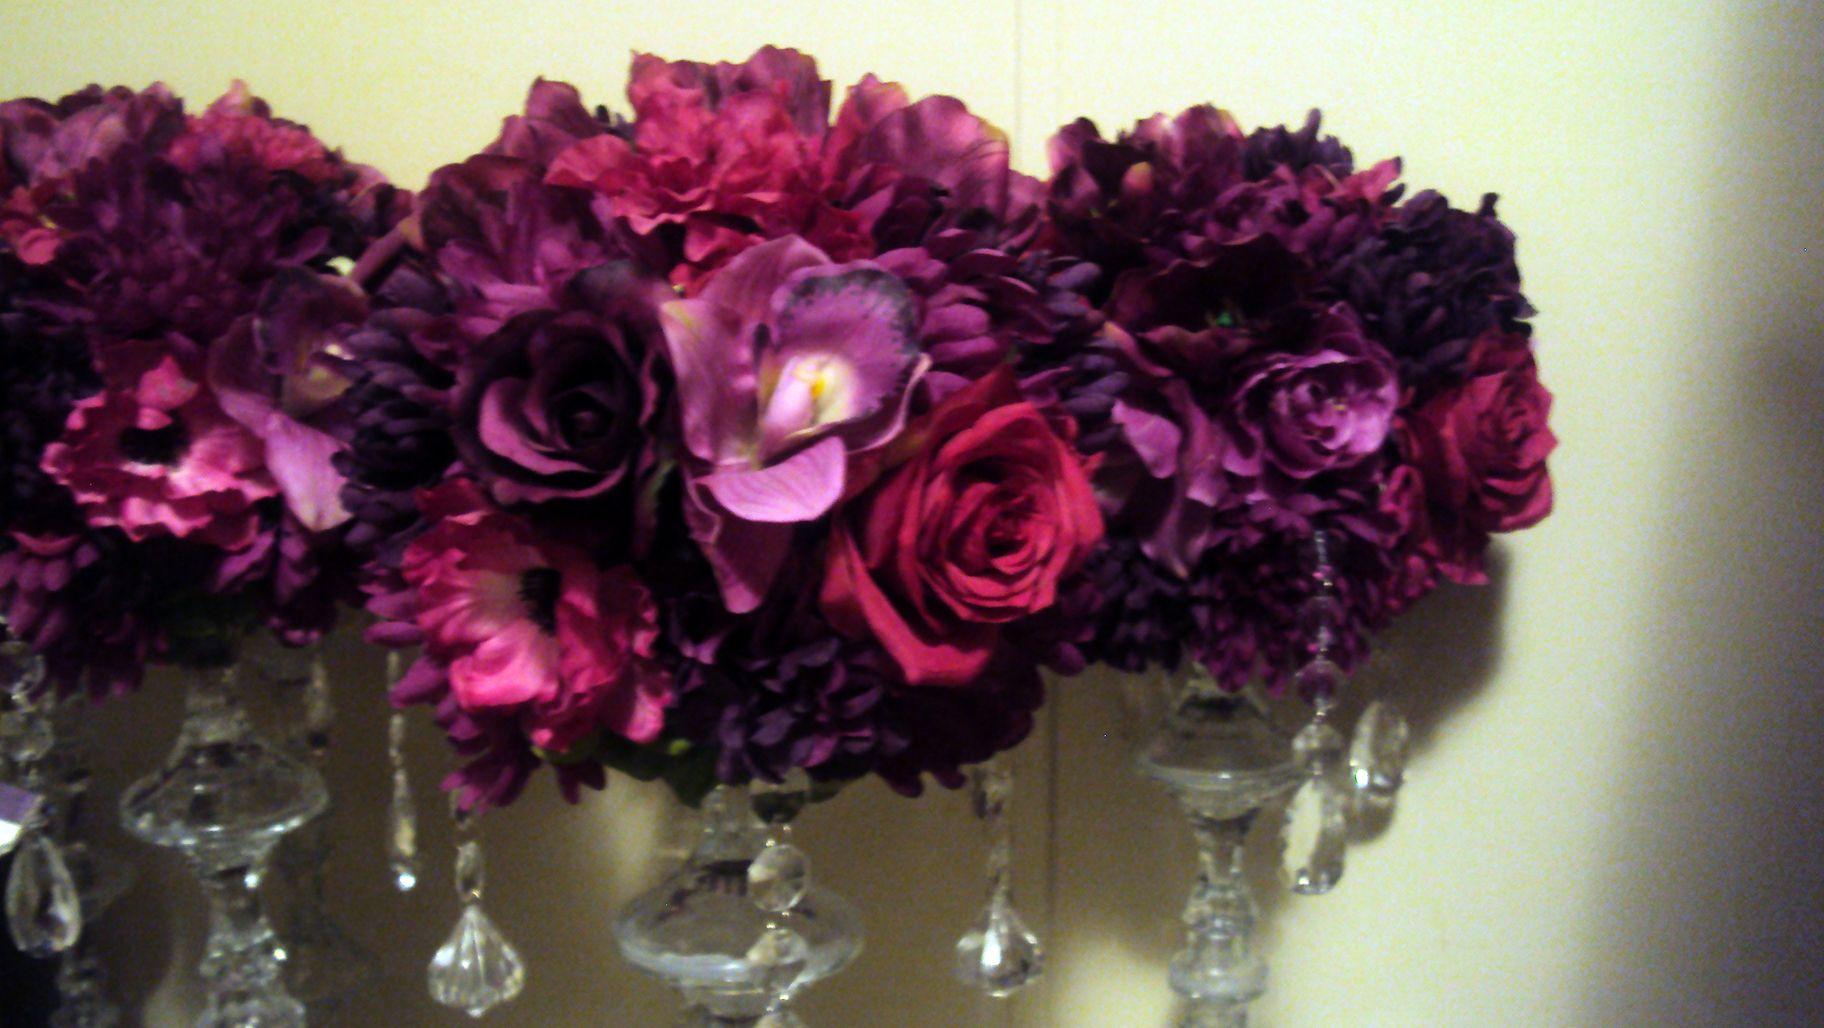 Plum Wedding Centerpieces Decor Usa Michigan Fl And Crystal